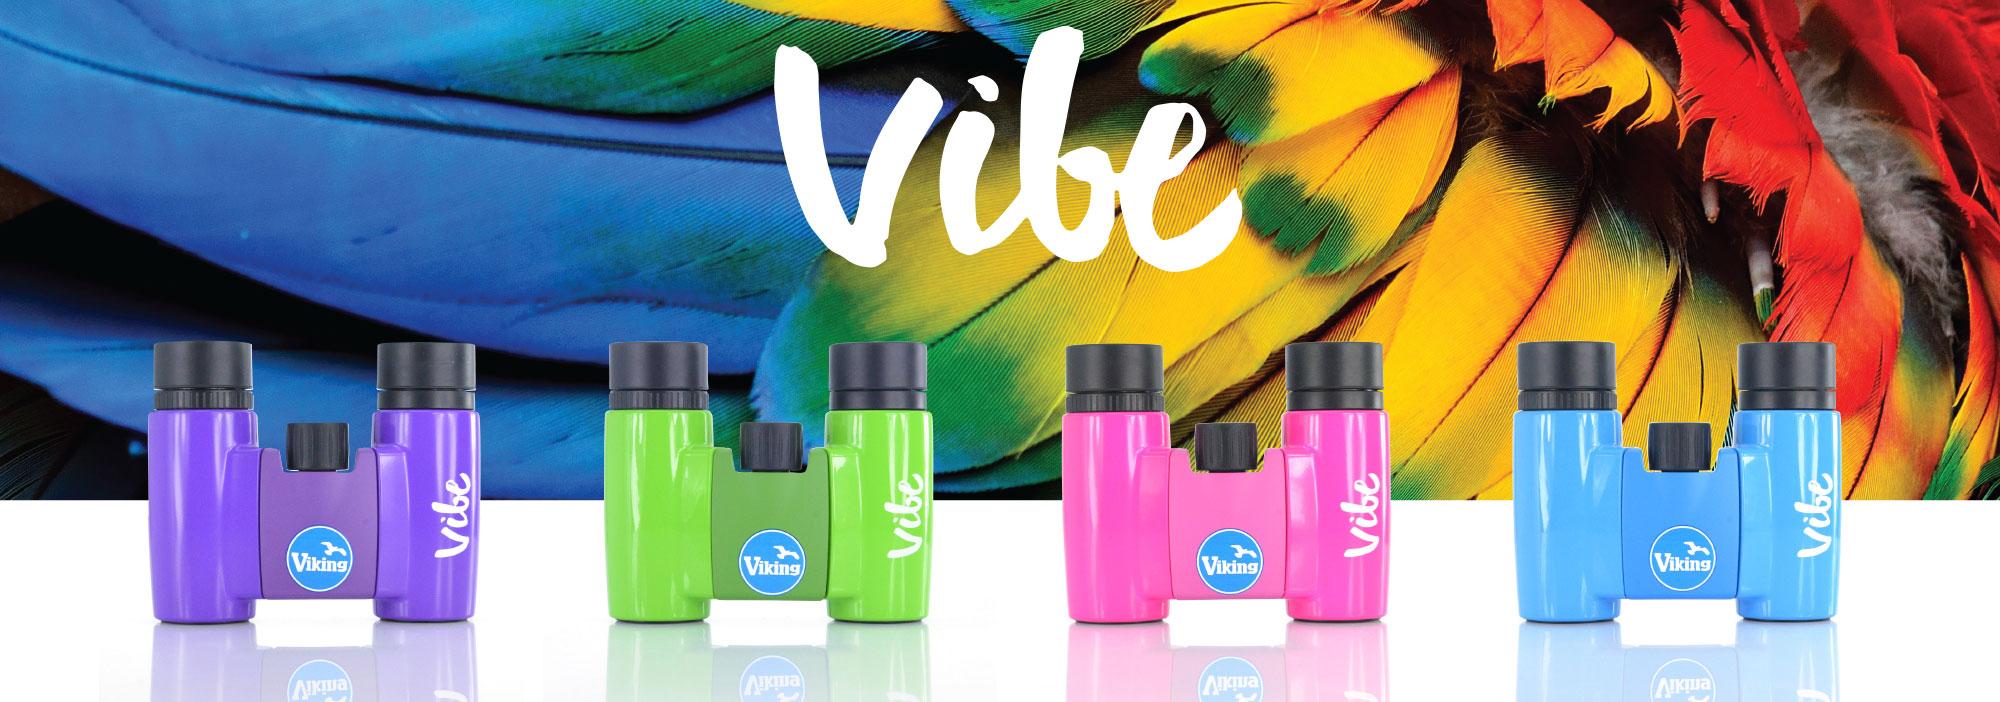 vibe-banner